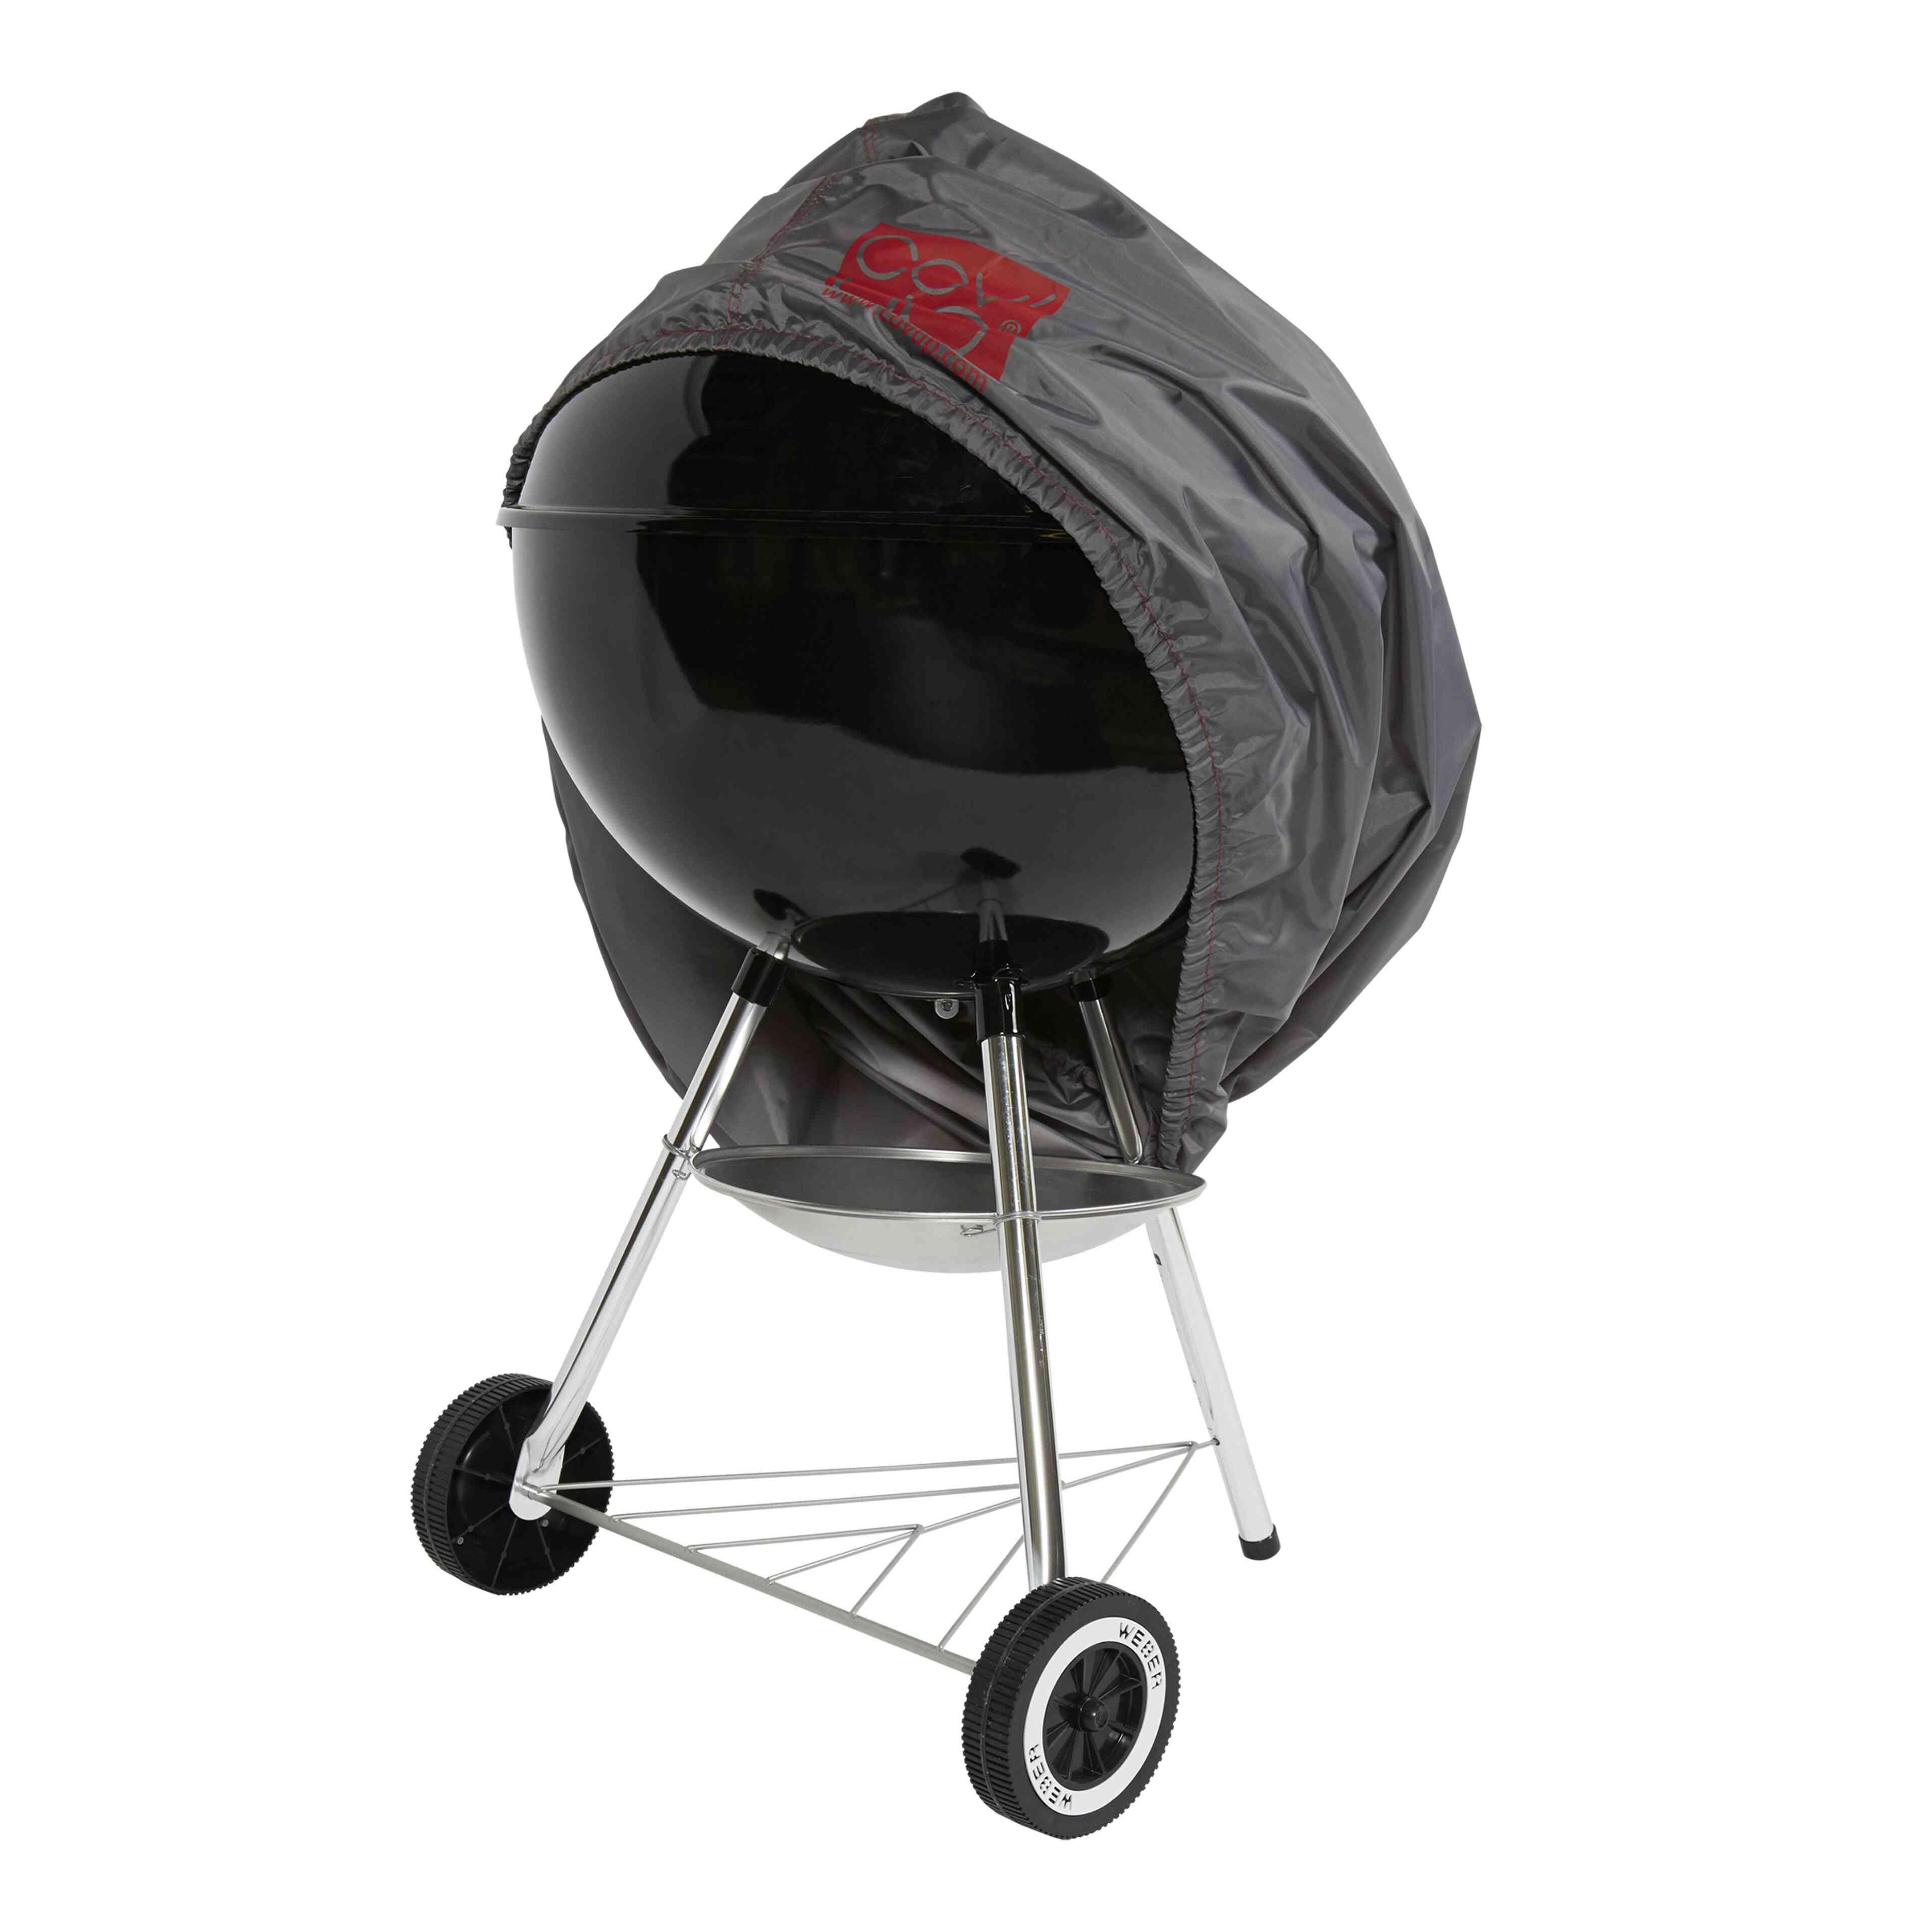 housse de protection barbecue rond 70 cm. Black Bedroom Furniture Sets. Home Design Ideas